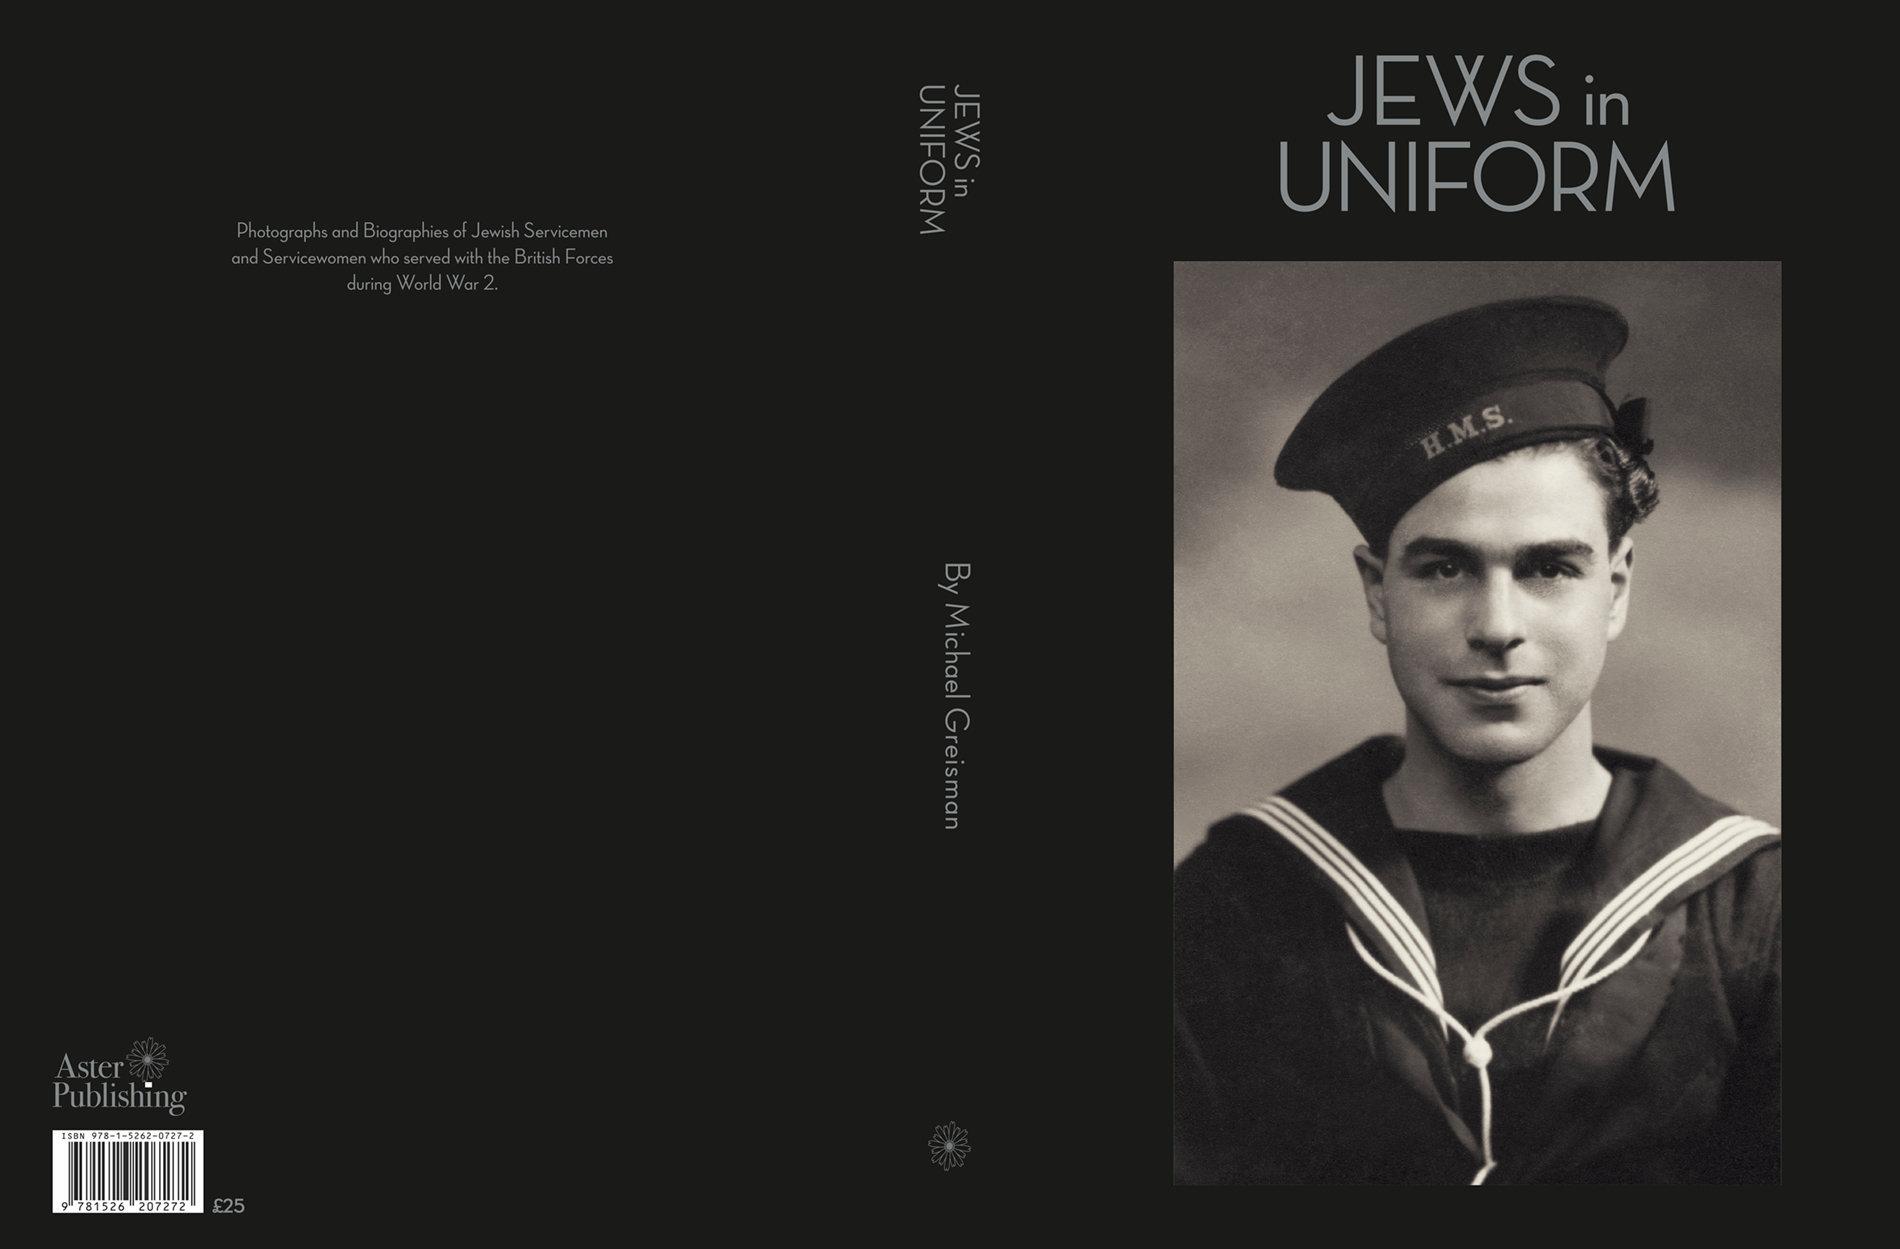 Jews in Uniform by Michael Greisman